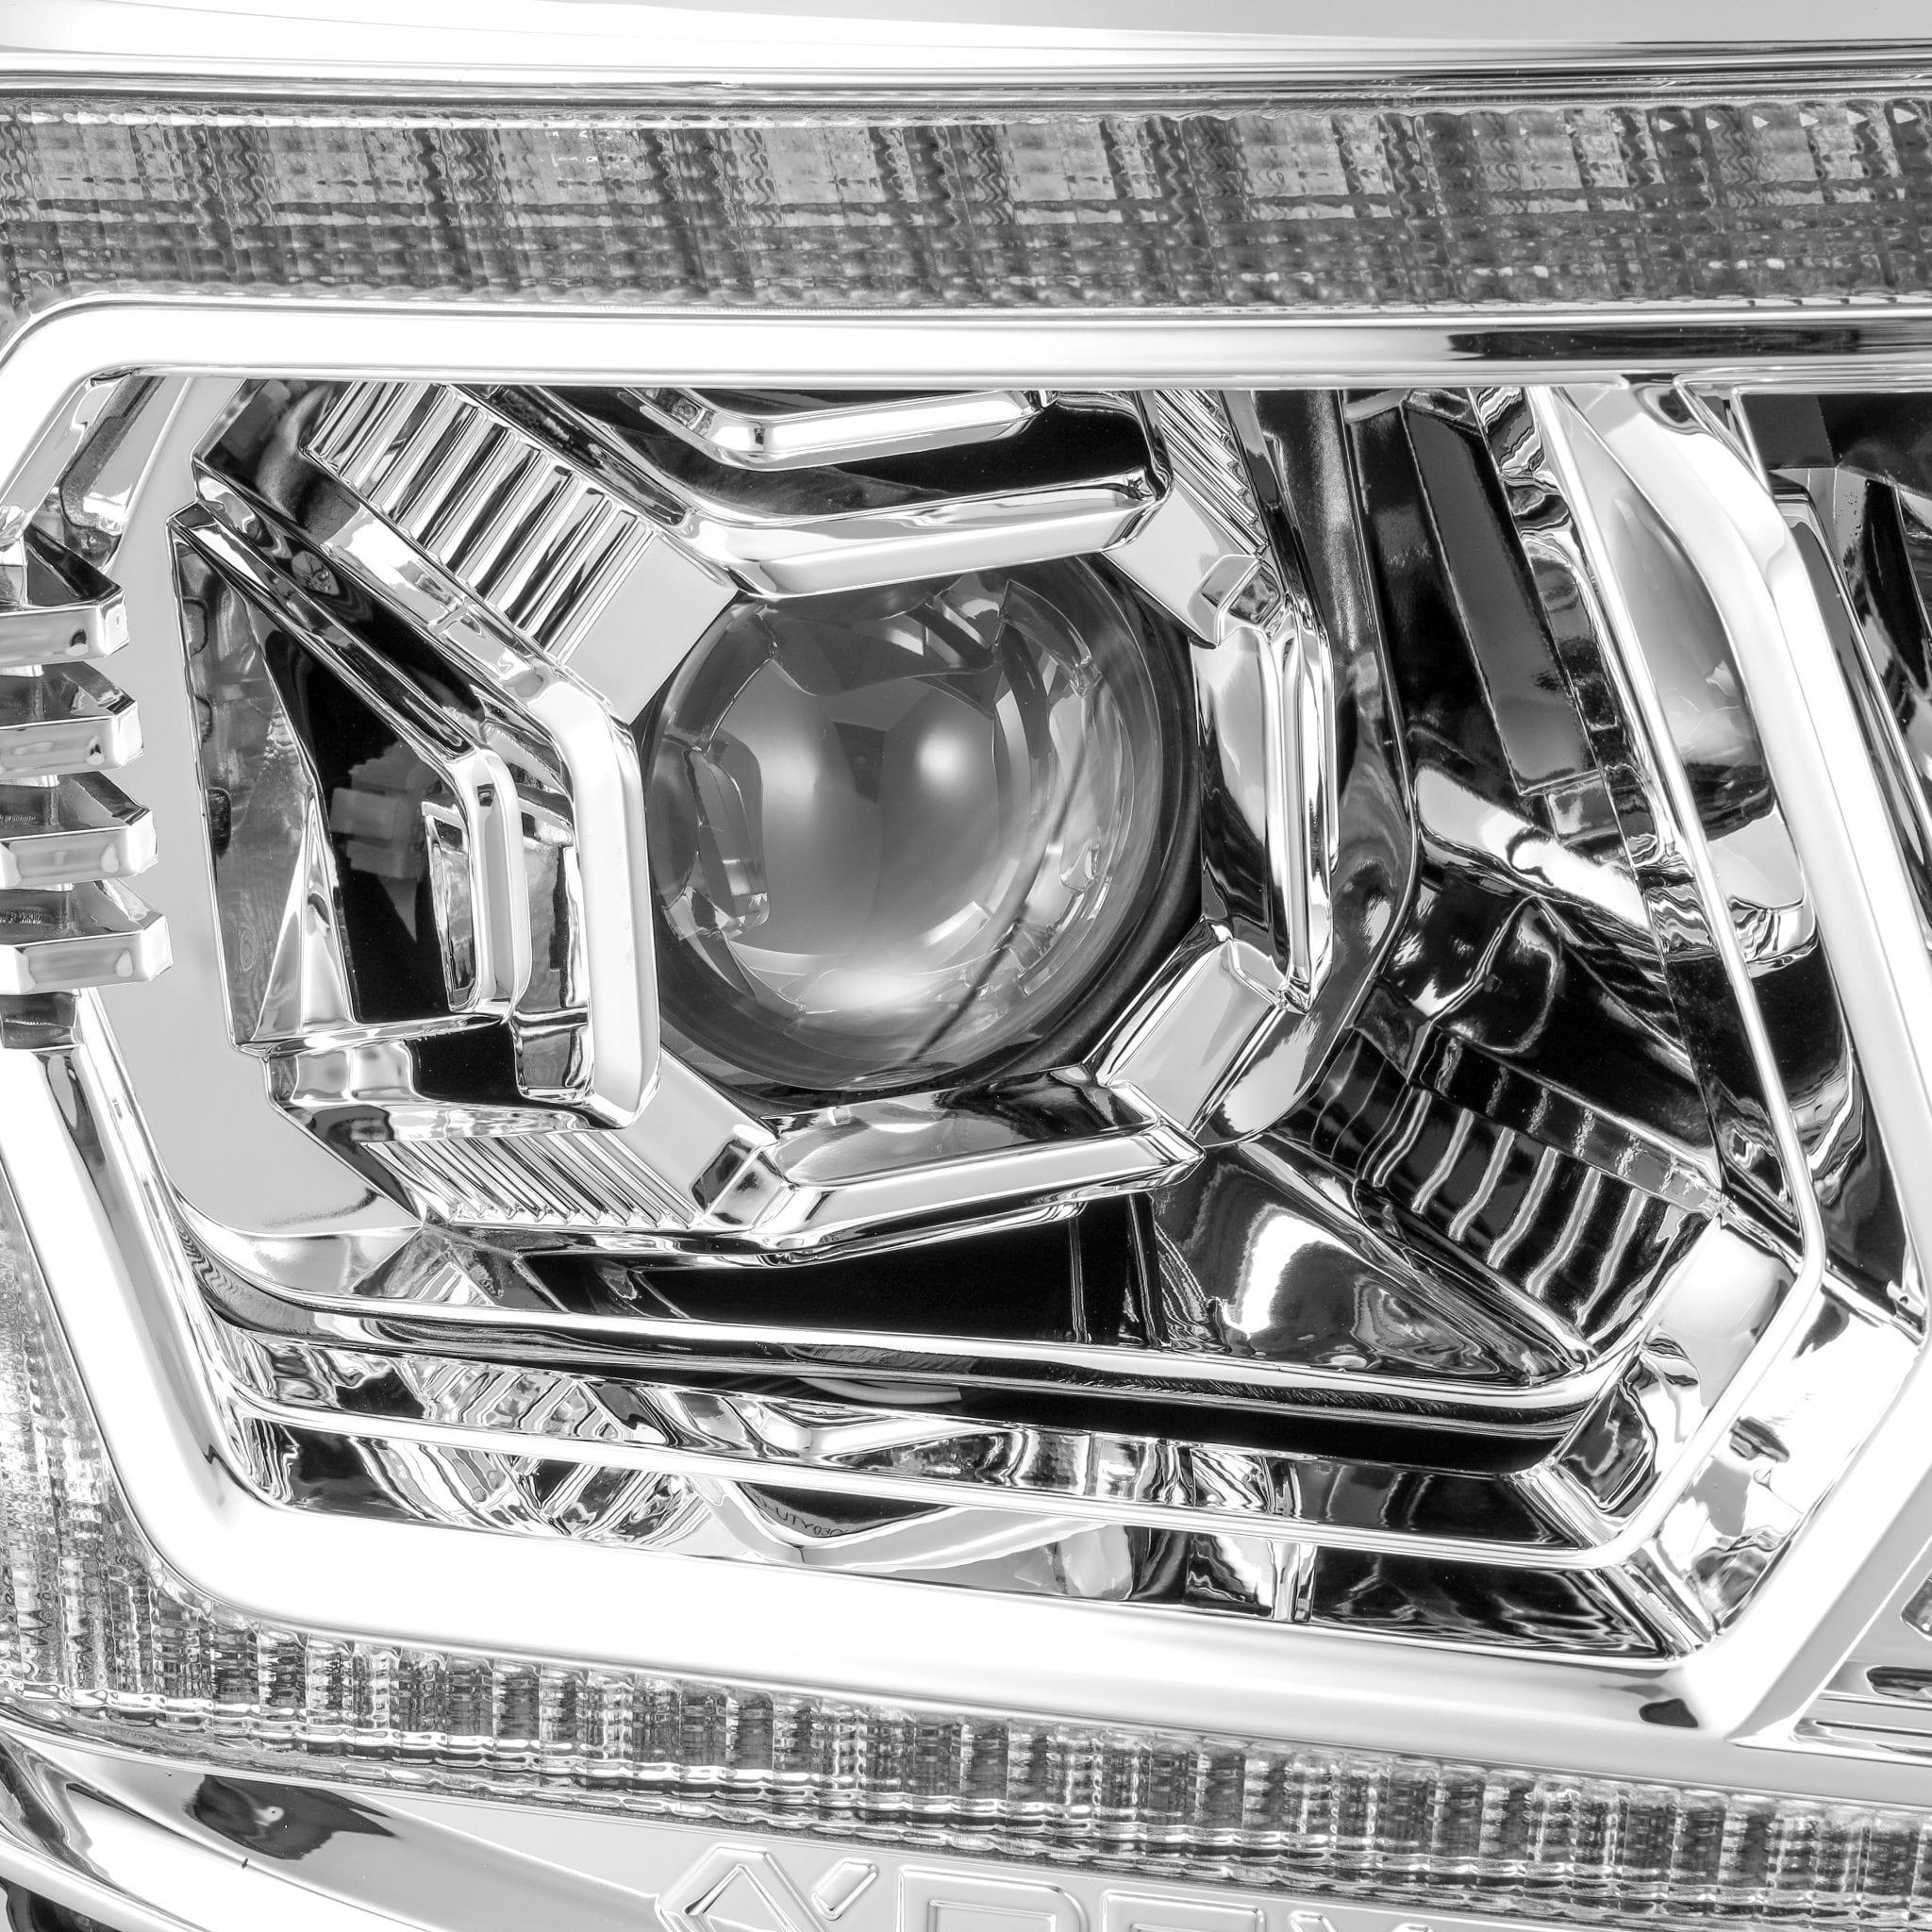 AlphaRex 2005 2006 2007 2008 2009 2010 2011 Toyota Tacoma NOVA-Series LED Projector Headlights Chrome